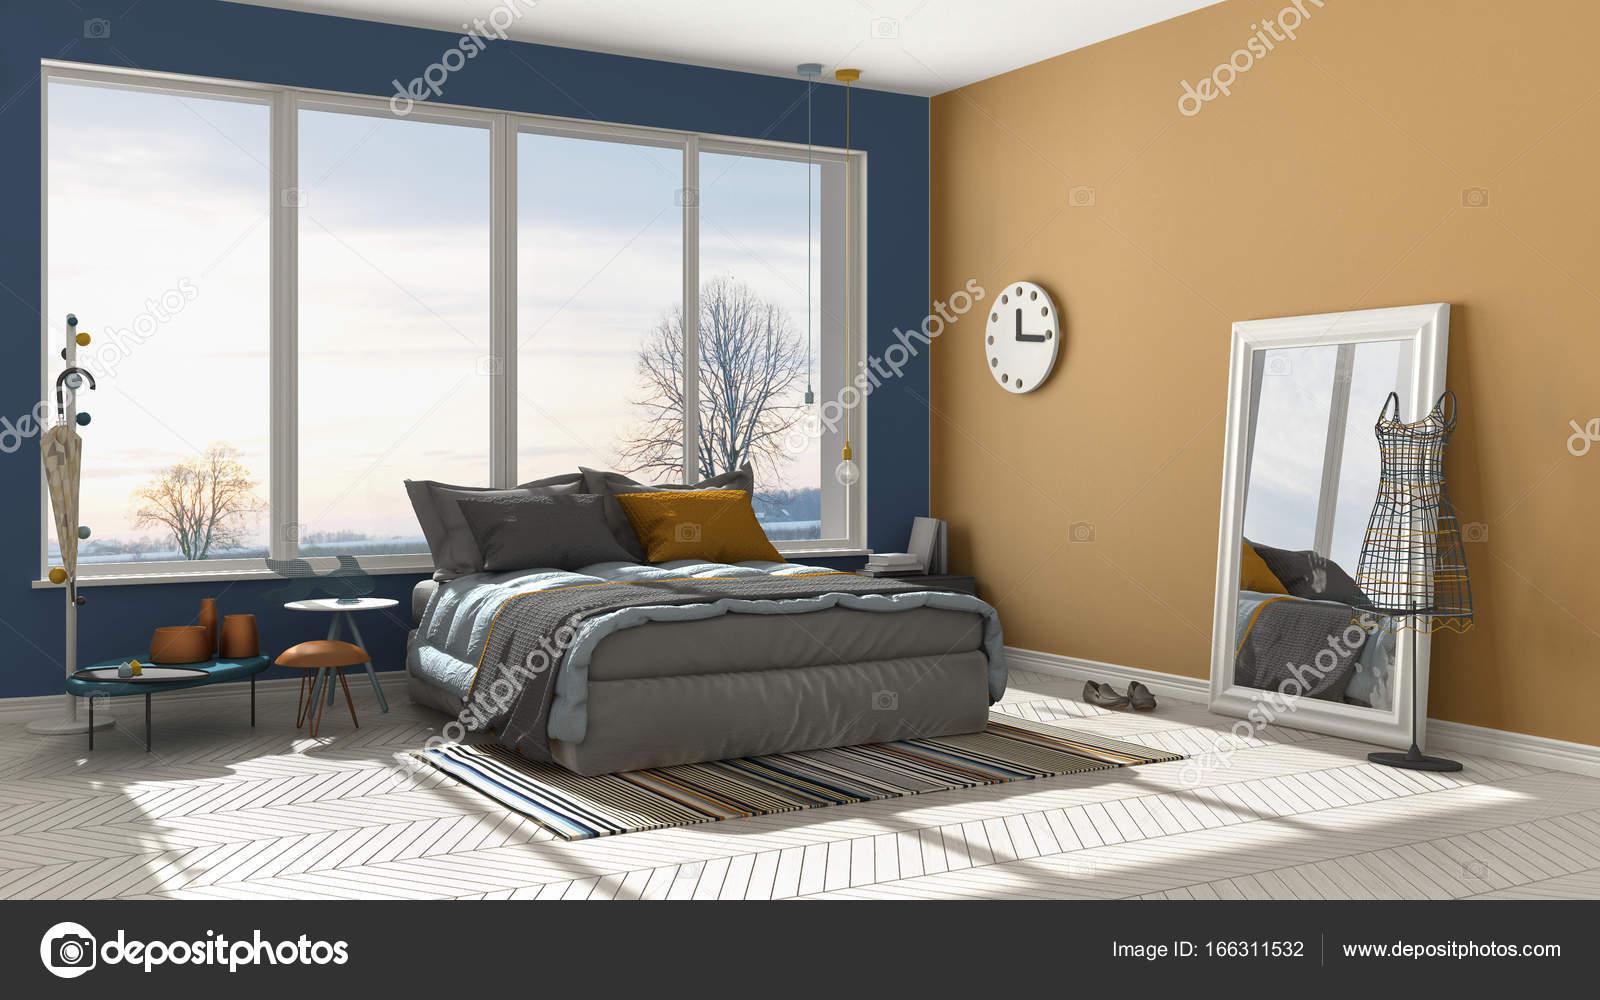 https://st3.depositphotos.com/1152281/16631/i/1600/depositphotos_166311532-stockafbeelding-gekleurde-moderne-blauwe-en-oranje.jpg